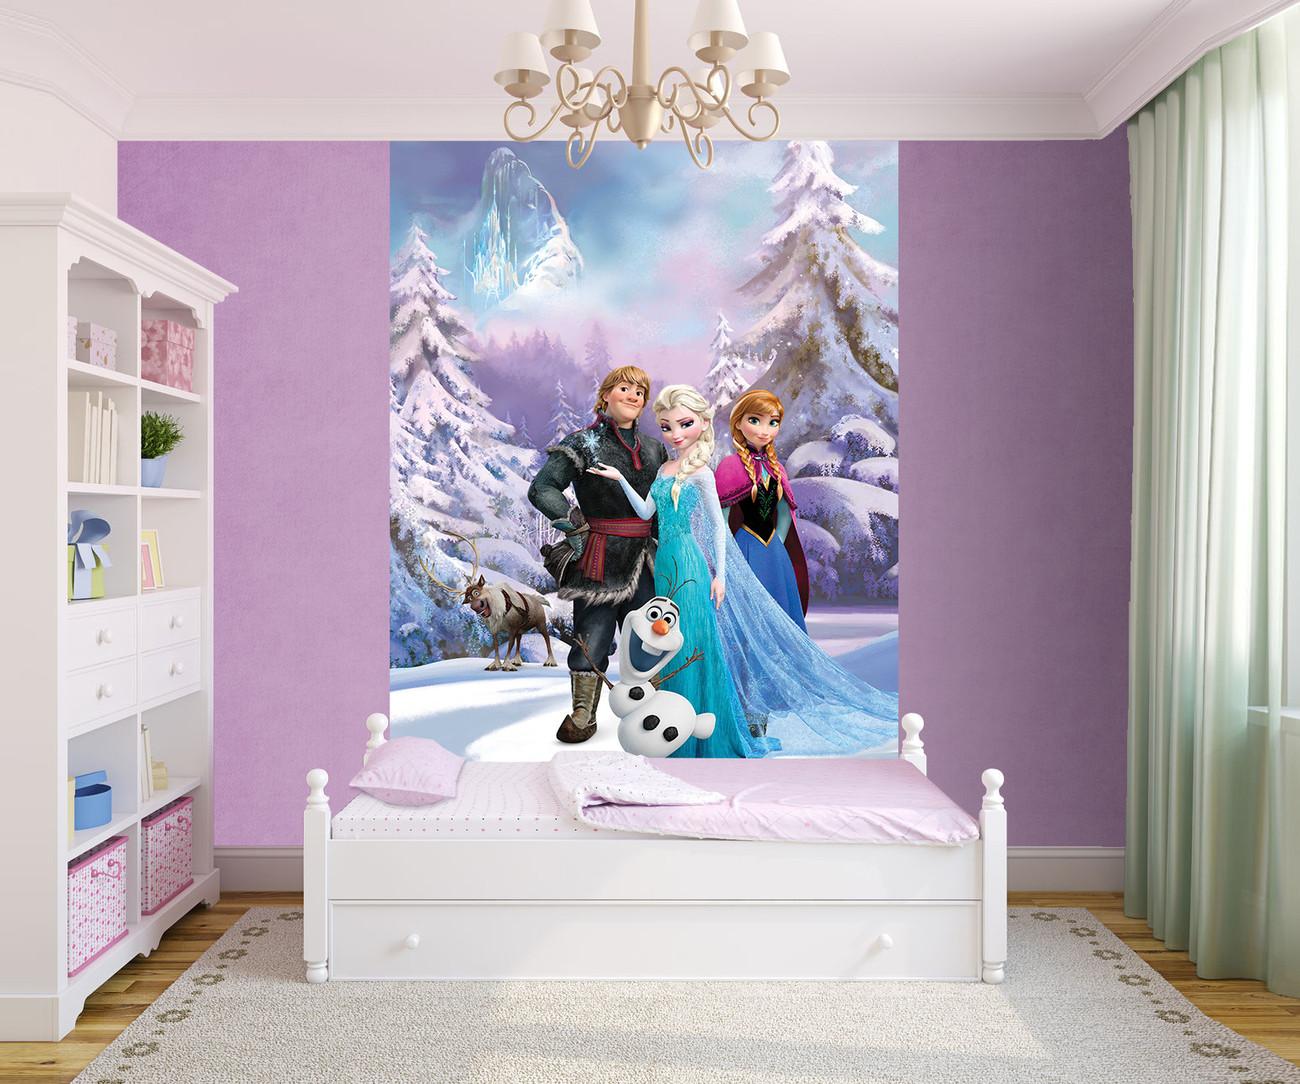 la reine des neiges group poster mural papier peint. Black Bedroom Furniture Sets. Home Design Ideas